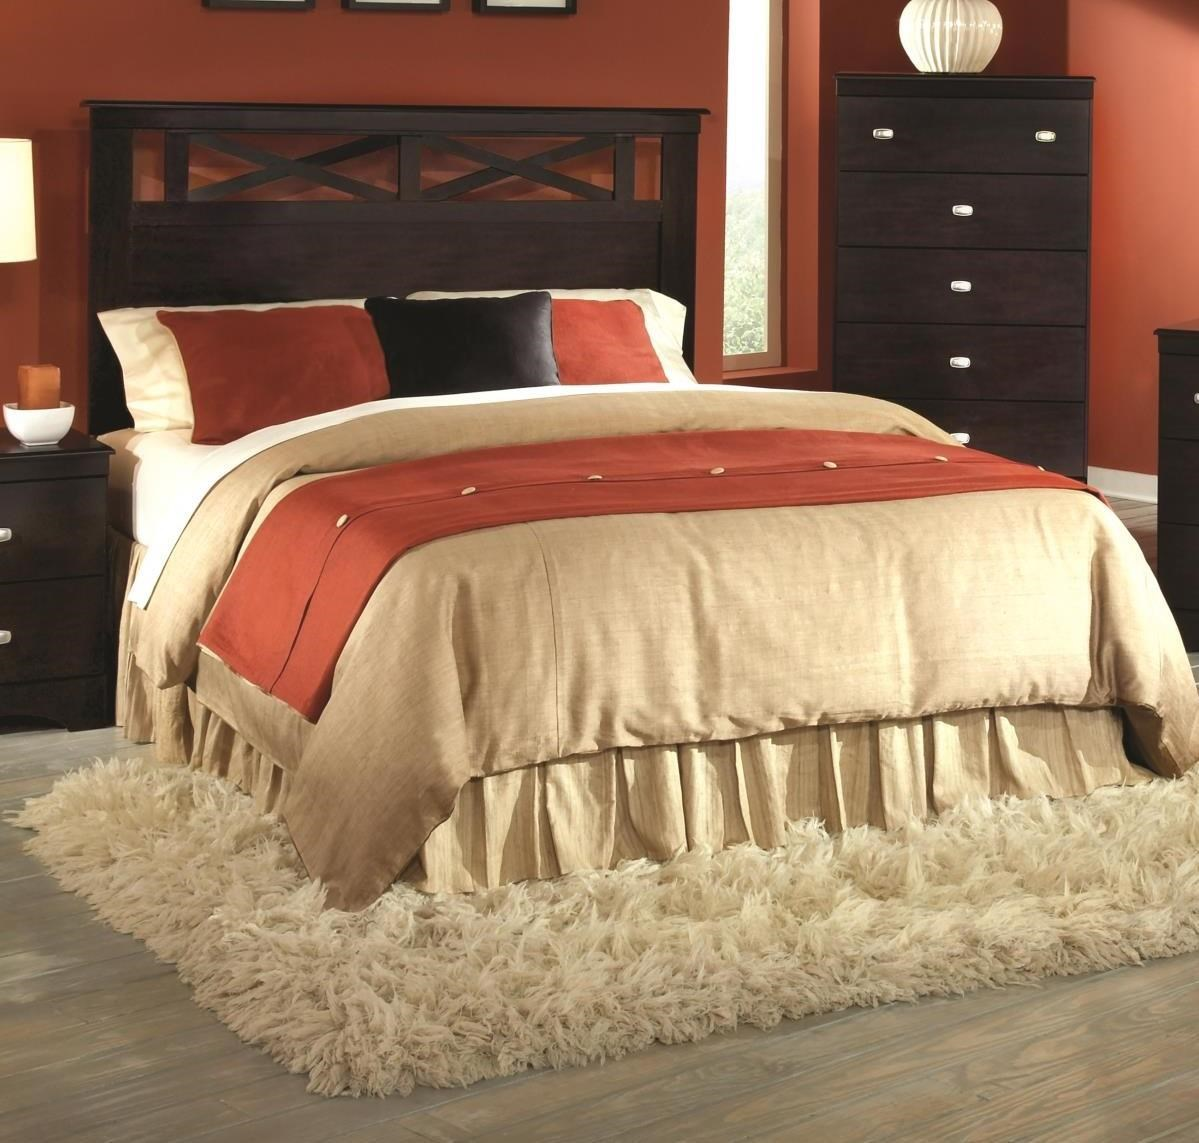 230 Tyler Full/ Queen Headboard by Kith Furniture at Furniture Fair - North Carolina